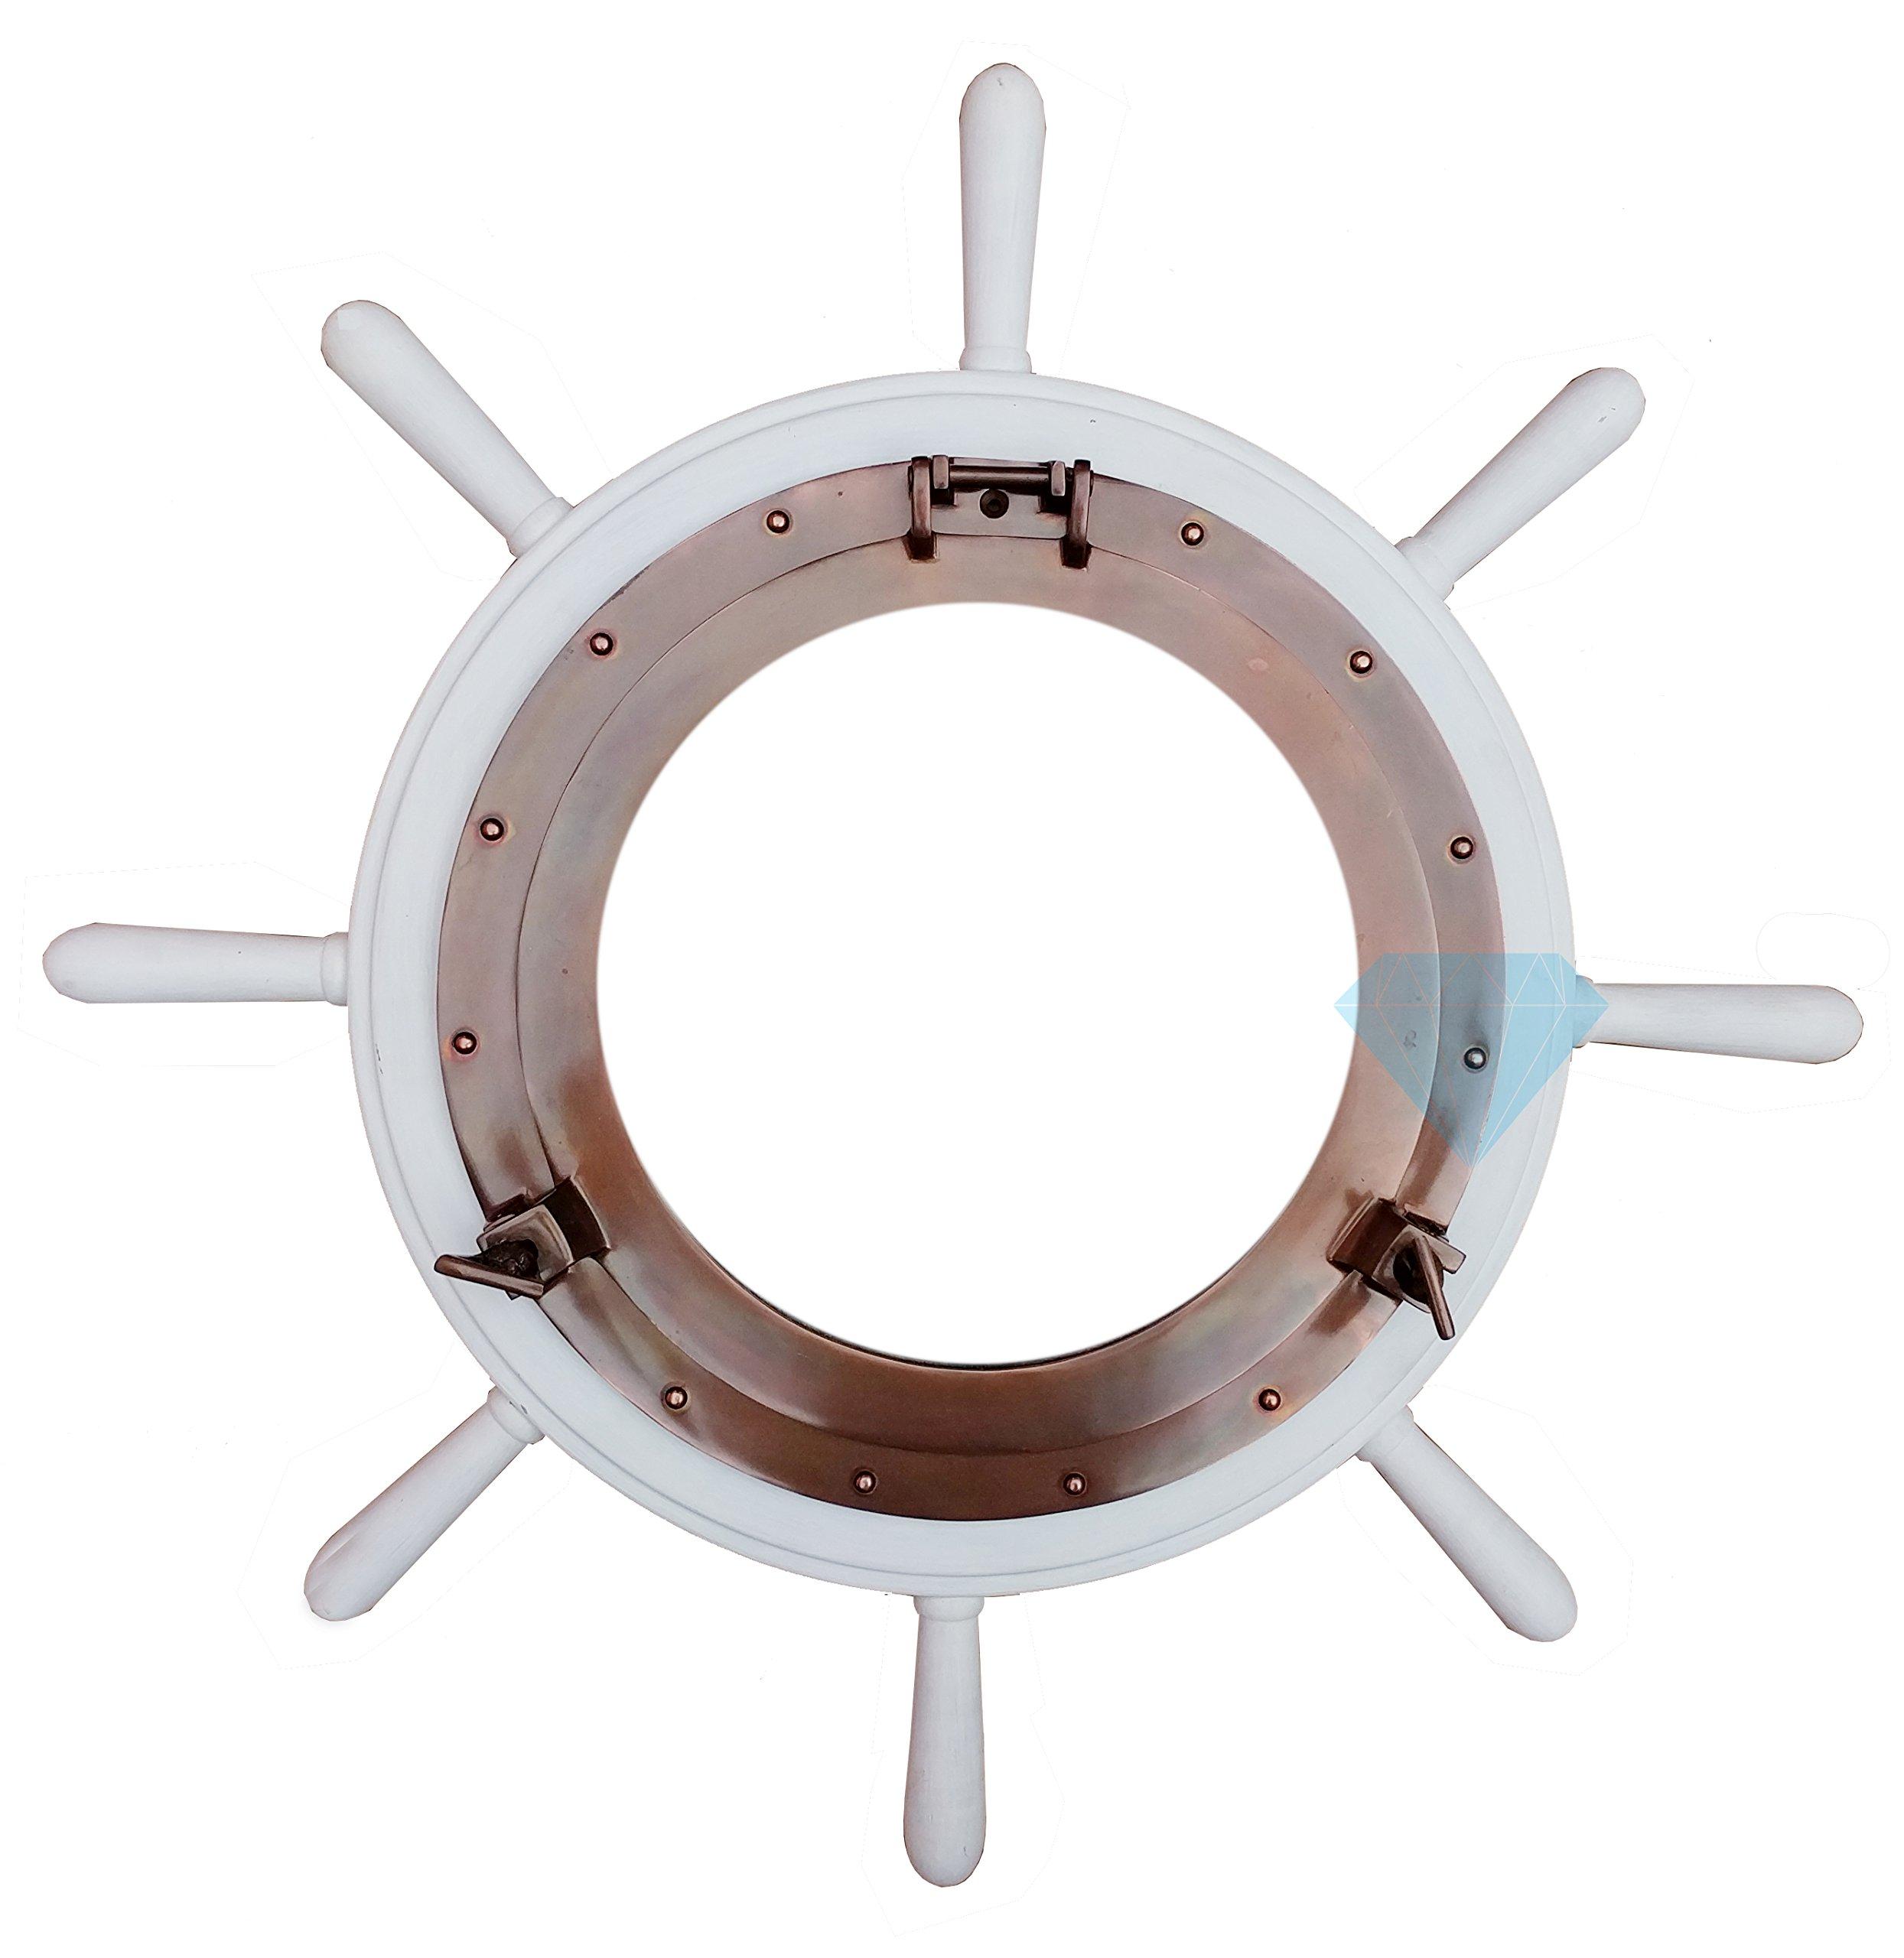 Classic White Nautical Ship Wheel With Antique Rustic Sparkling Porthole Mirror   Premium Home Decor   Maritime Ocean House Gift   Nagina International (48 Inches)